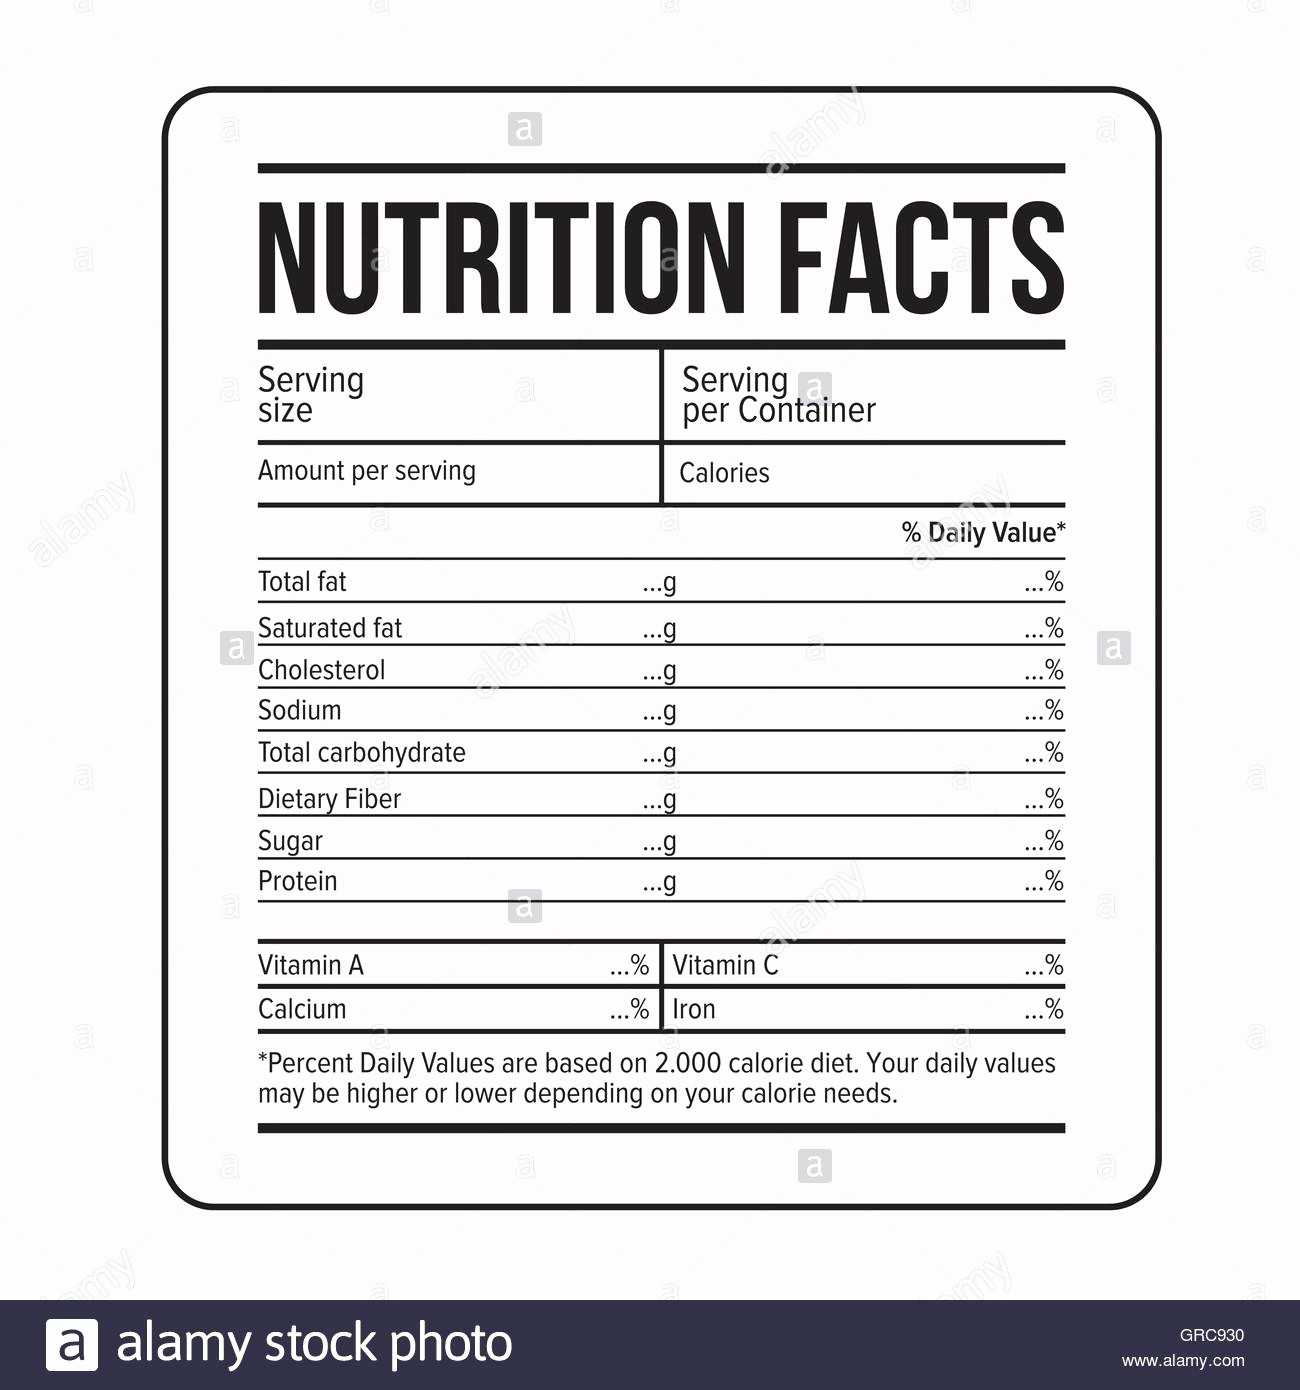 Nutrition Label Template Word - Raptor.redmini.co Regarding Nutrition Label Template Word